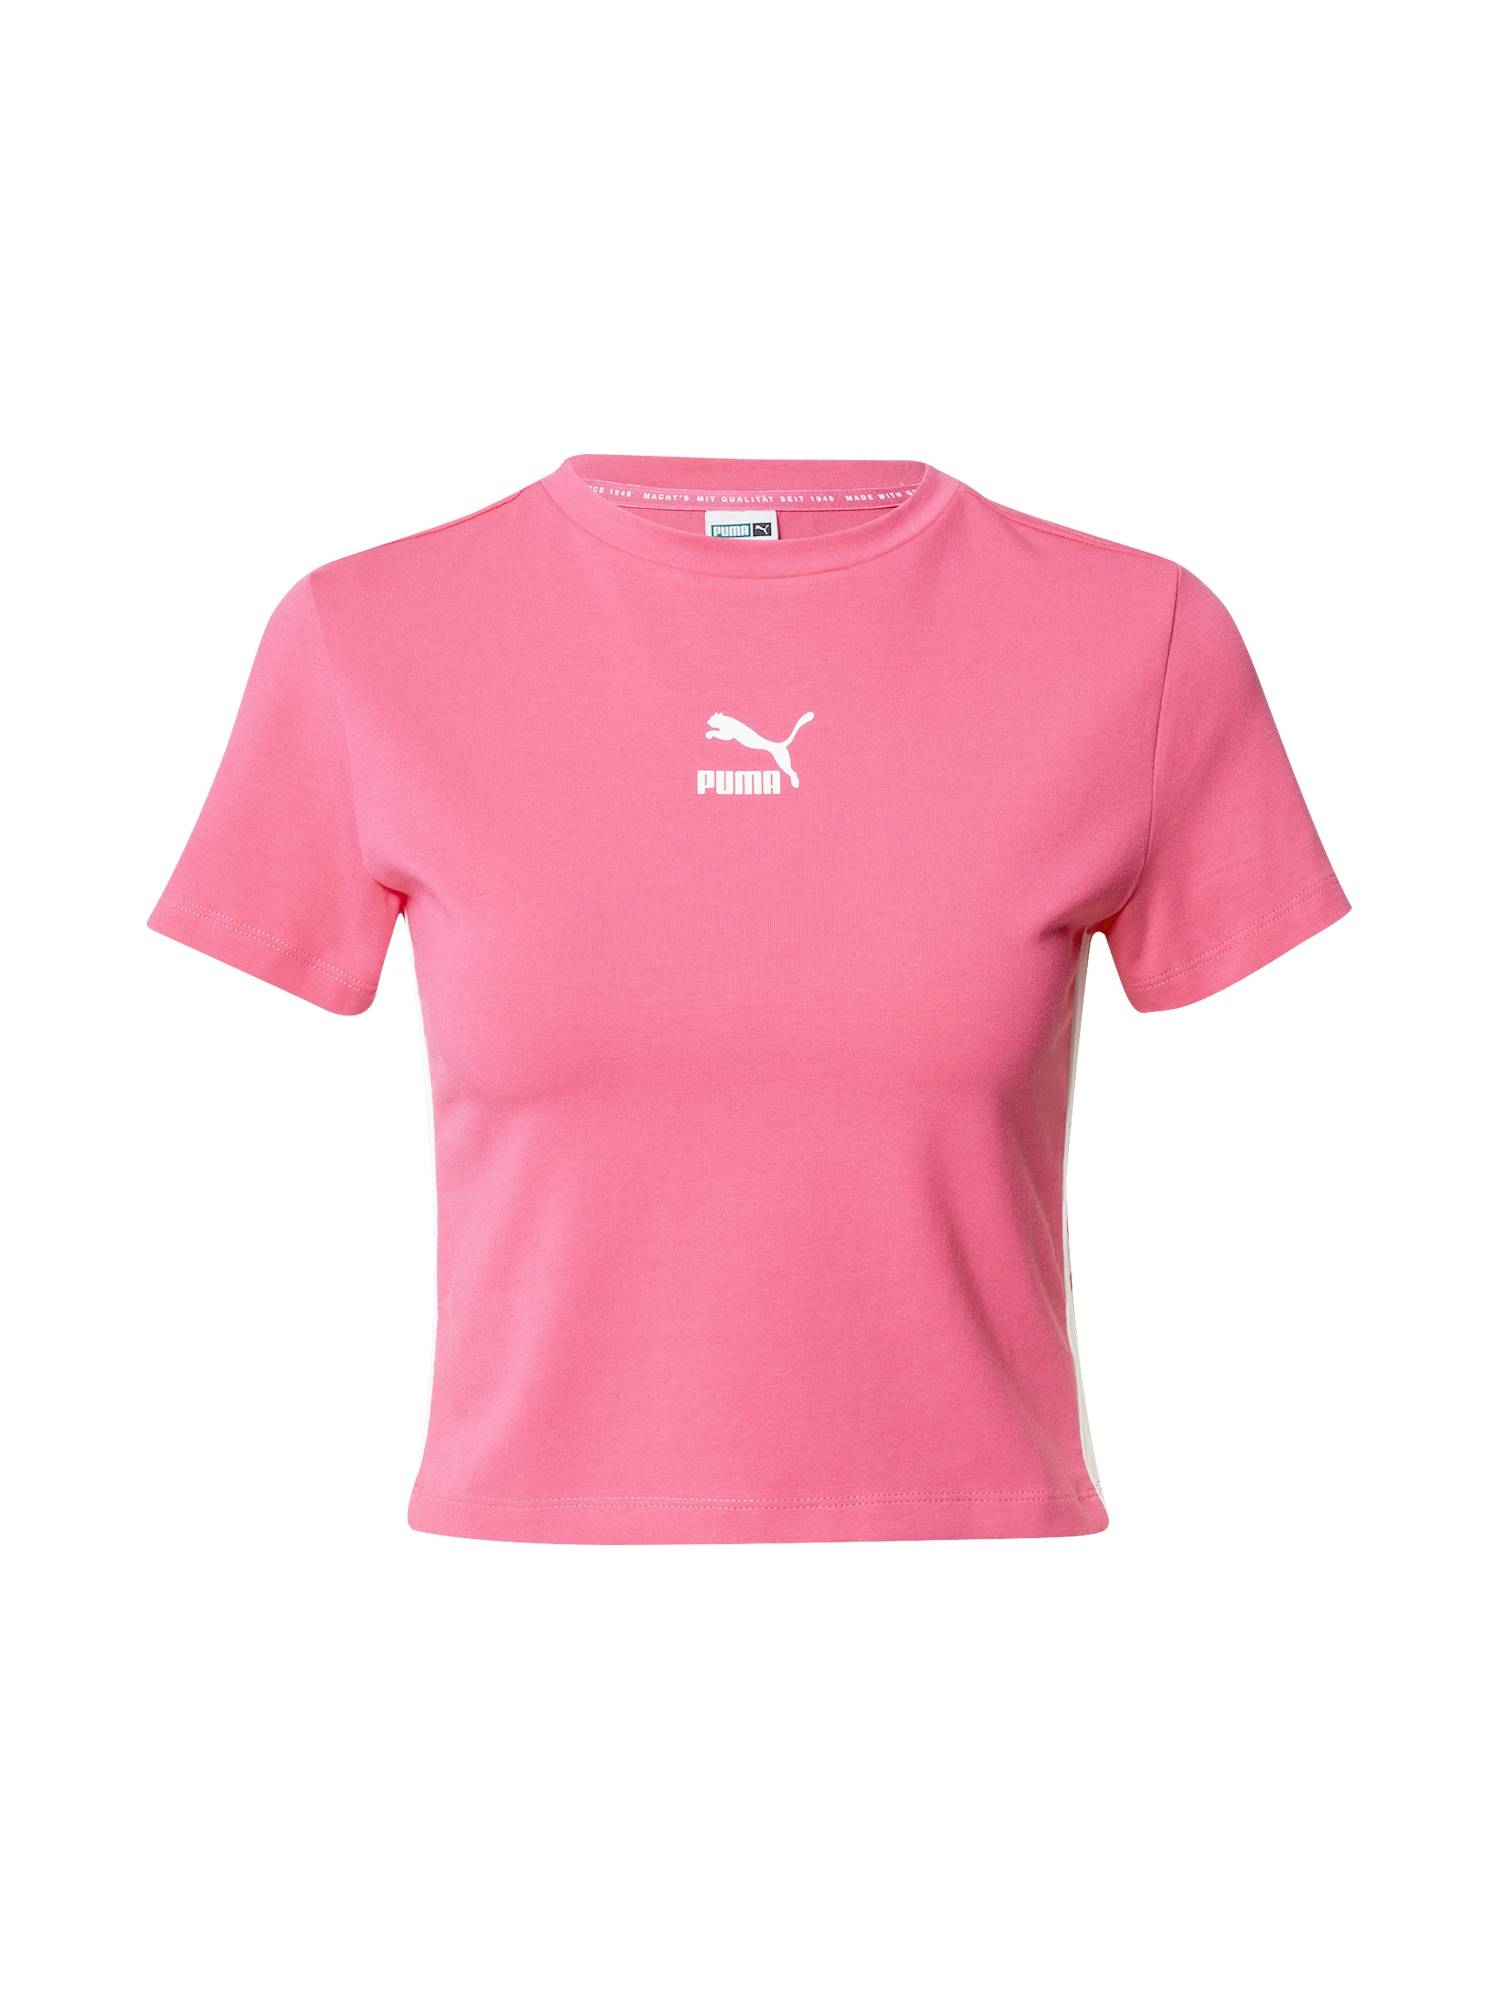 PUMA T-shirt  - Rose - Taille: S - female